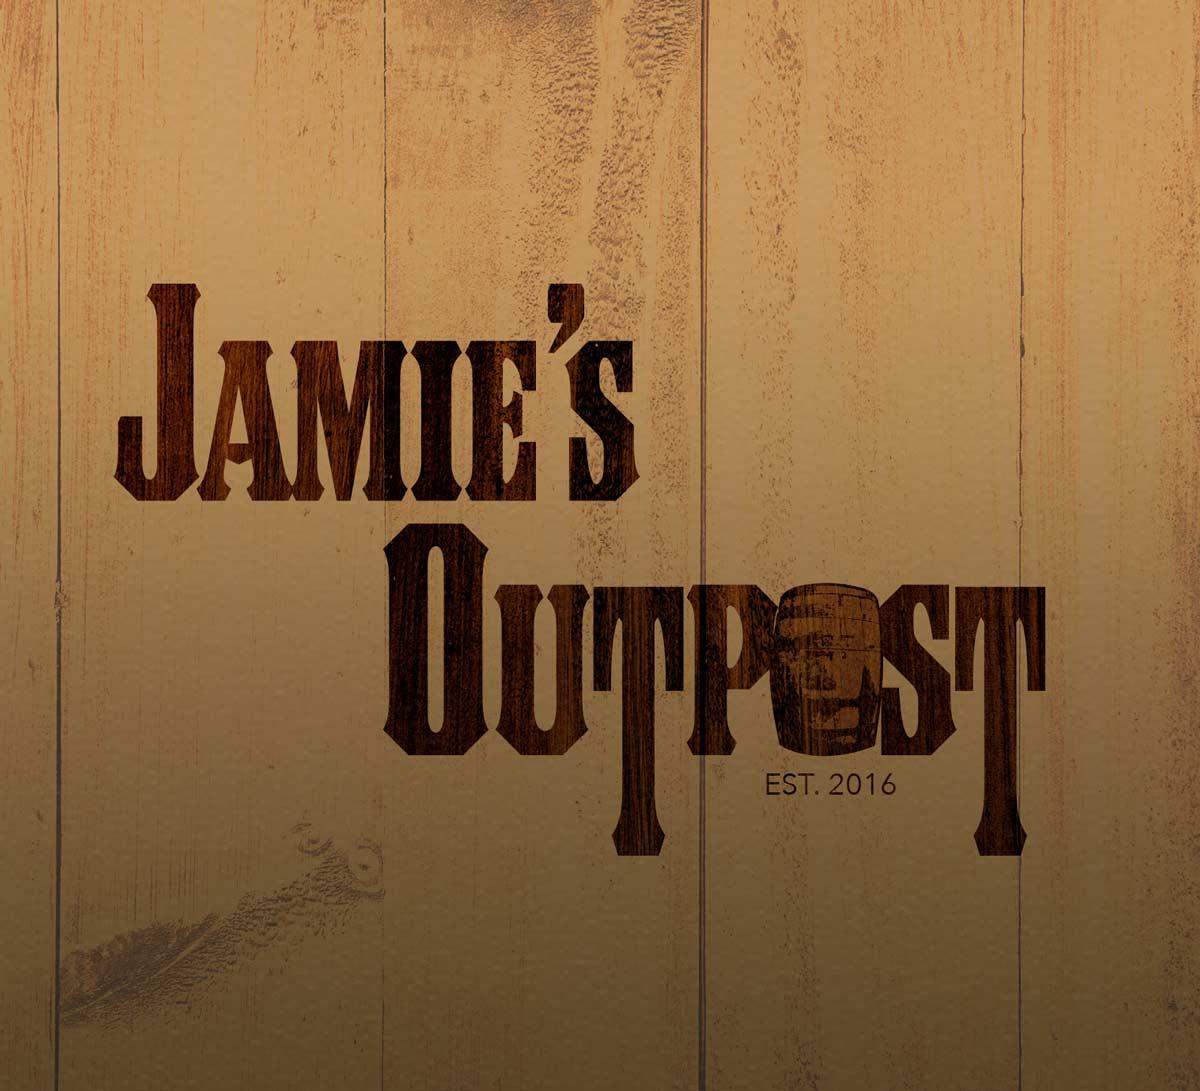 Jamie's Outpost Logo